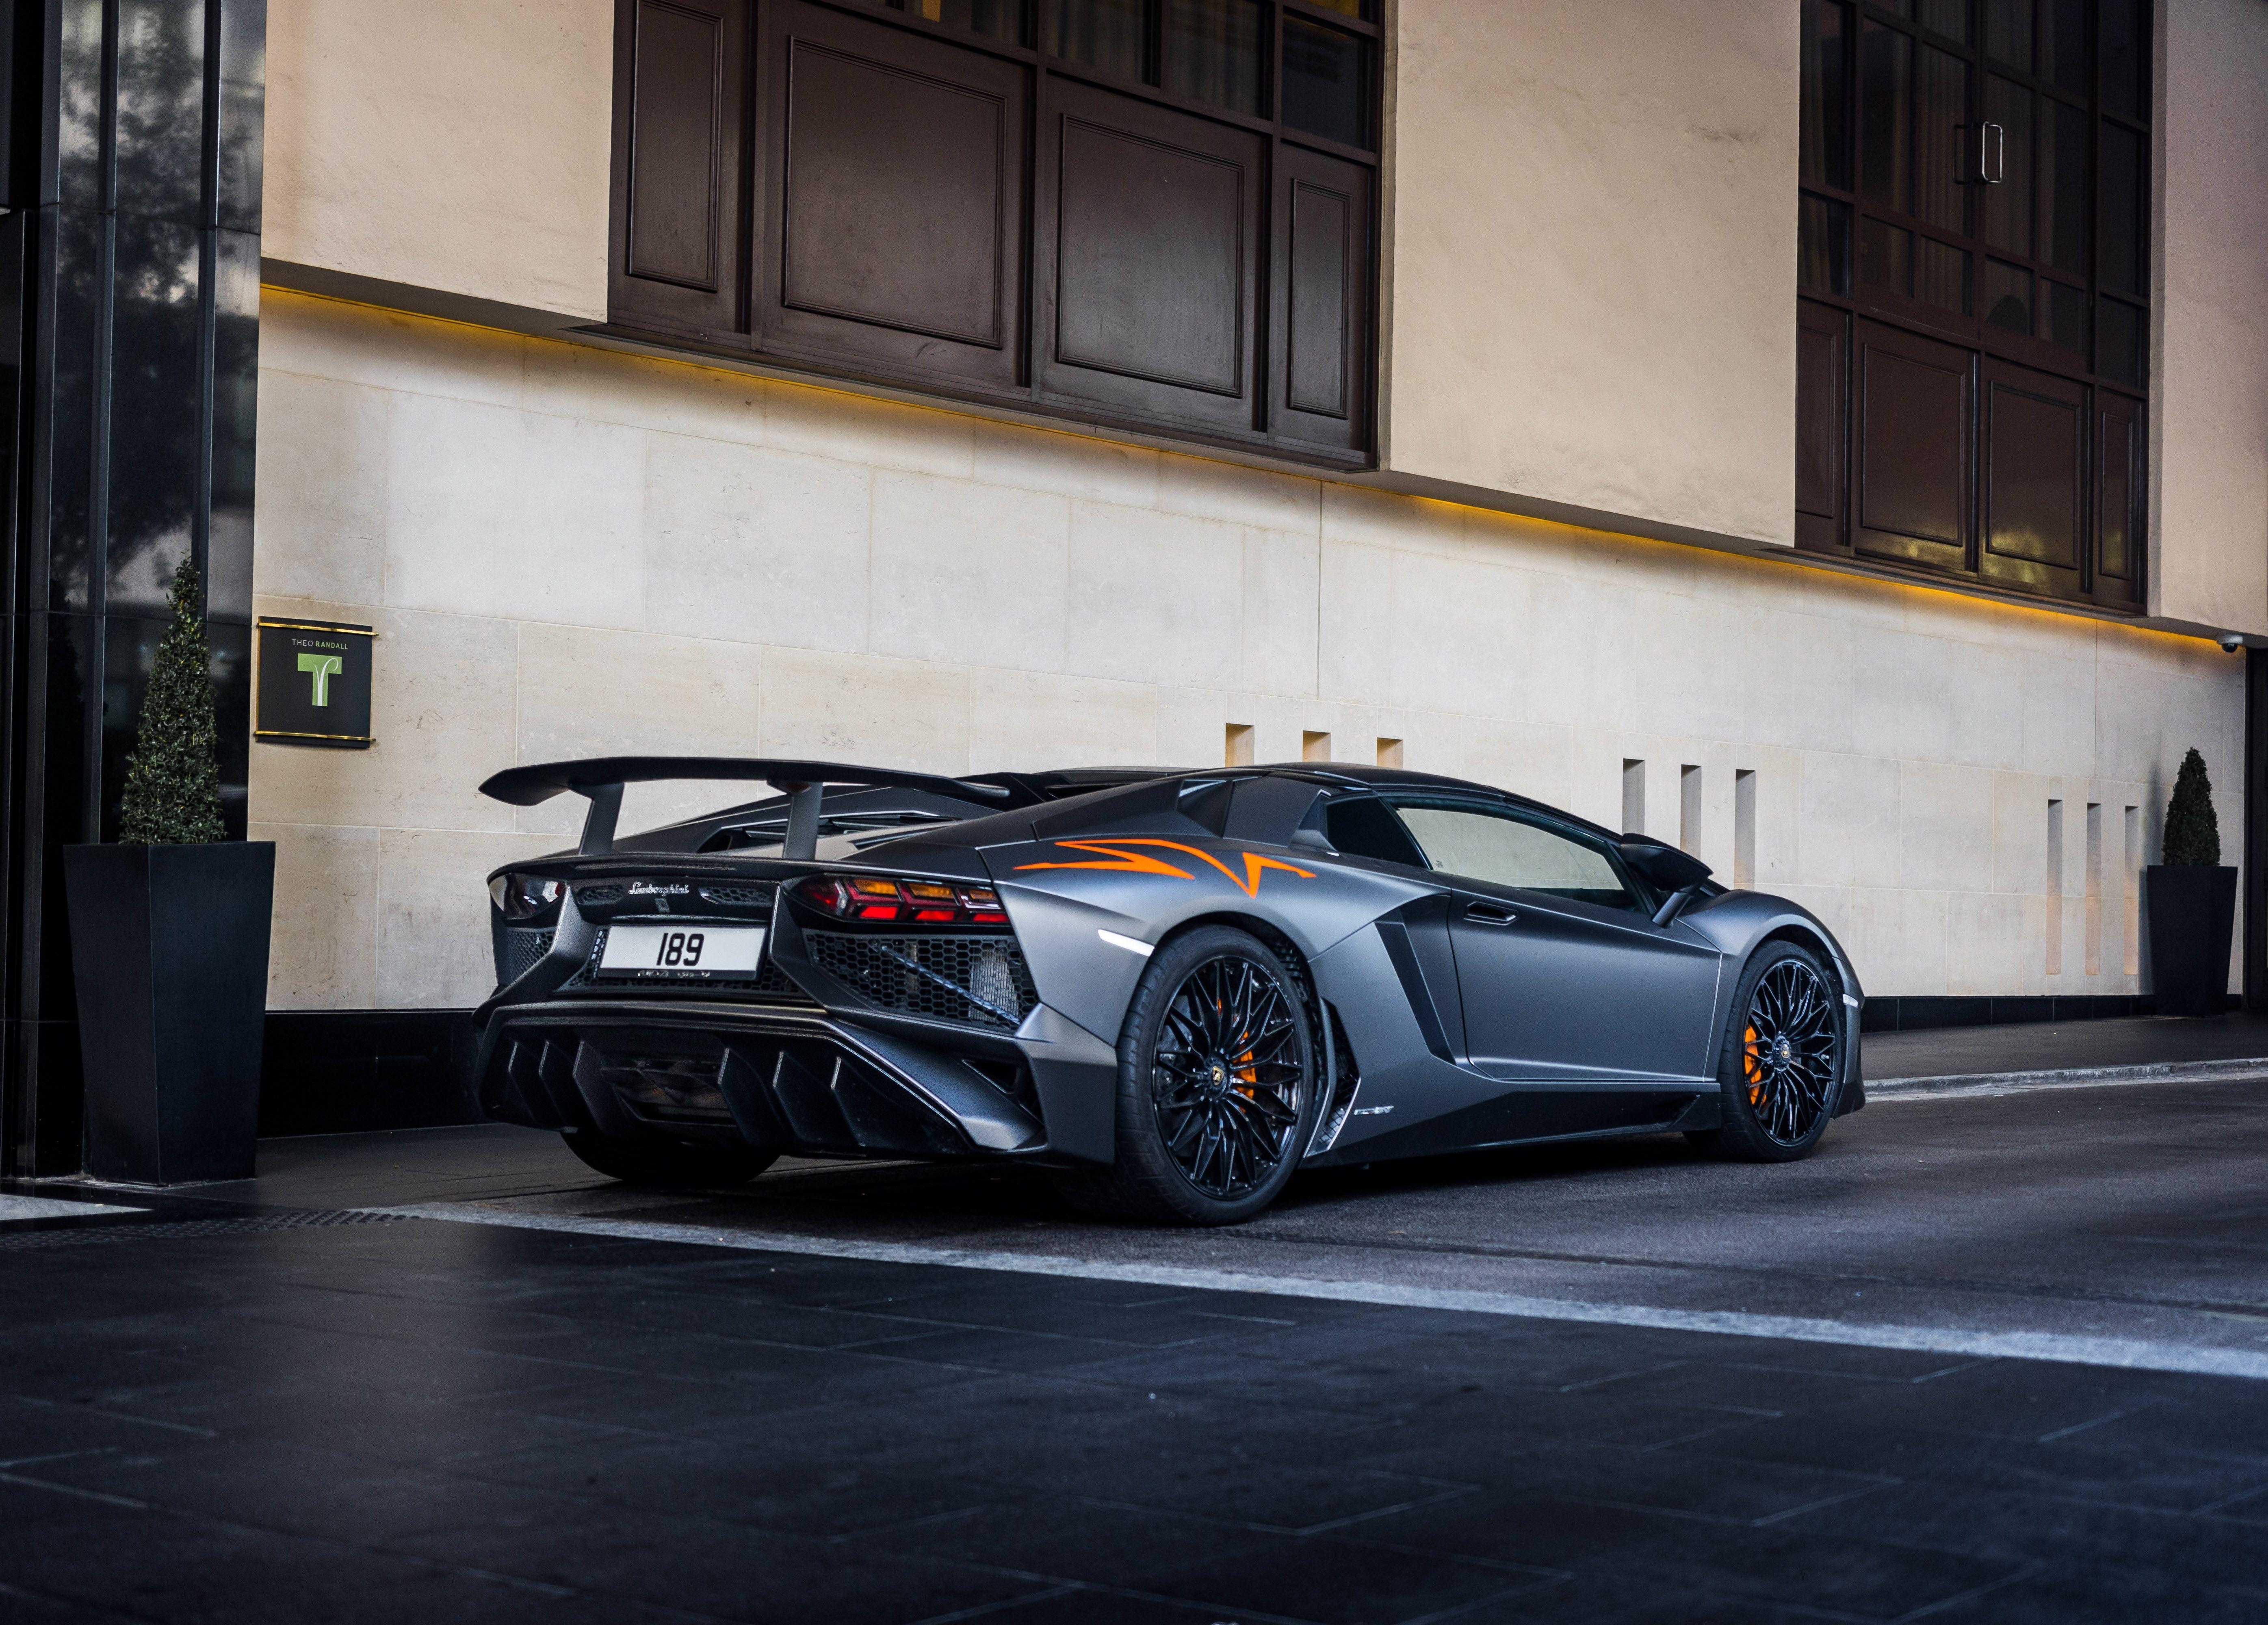 Lamborghini Aventador SV Wallpapers - Wallpaper Cave